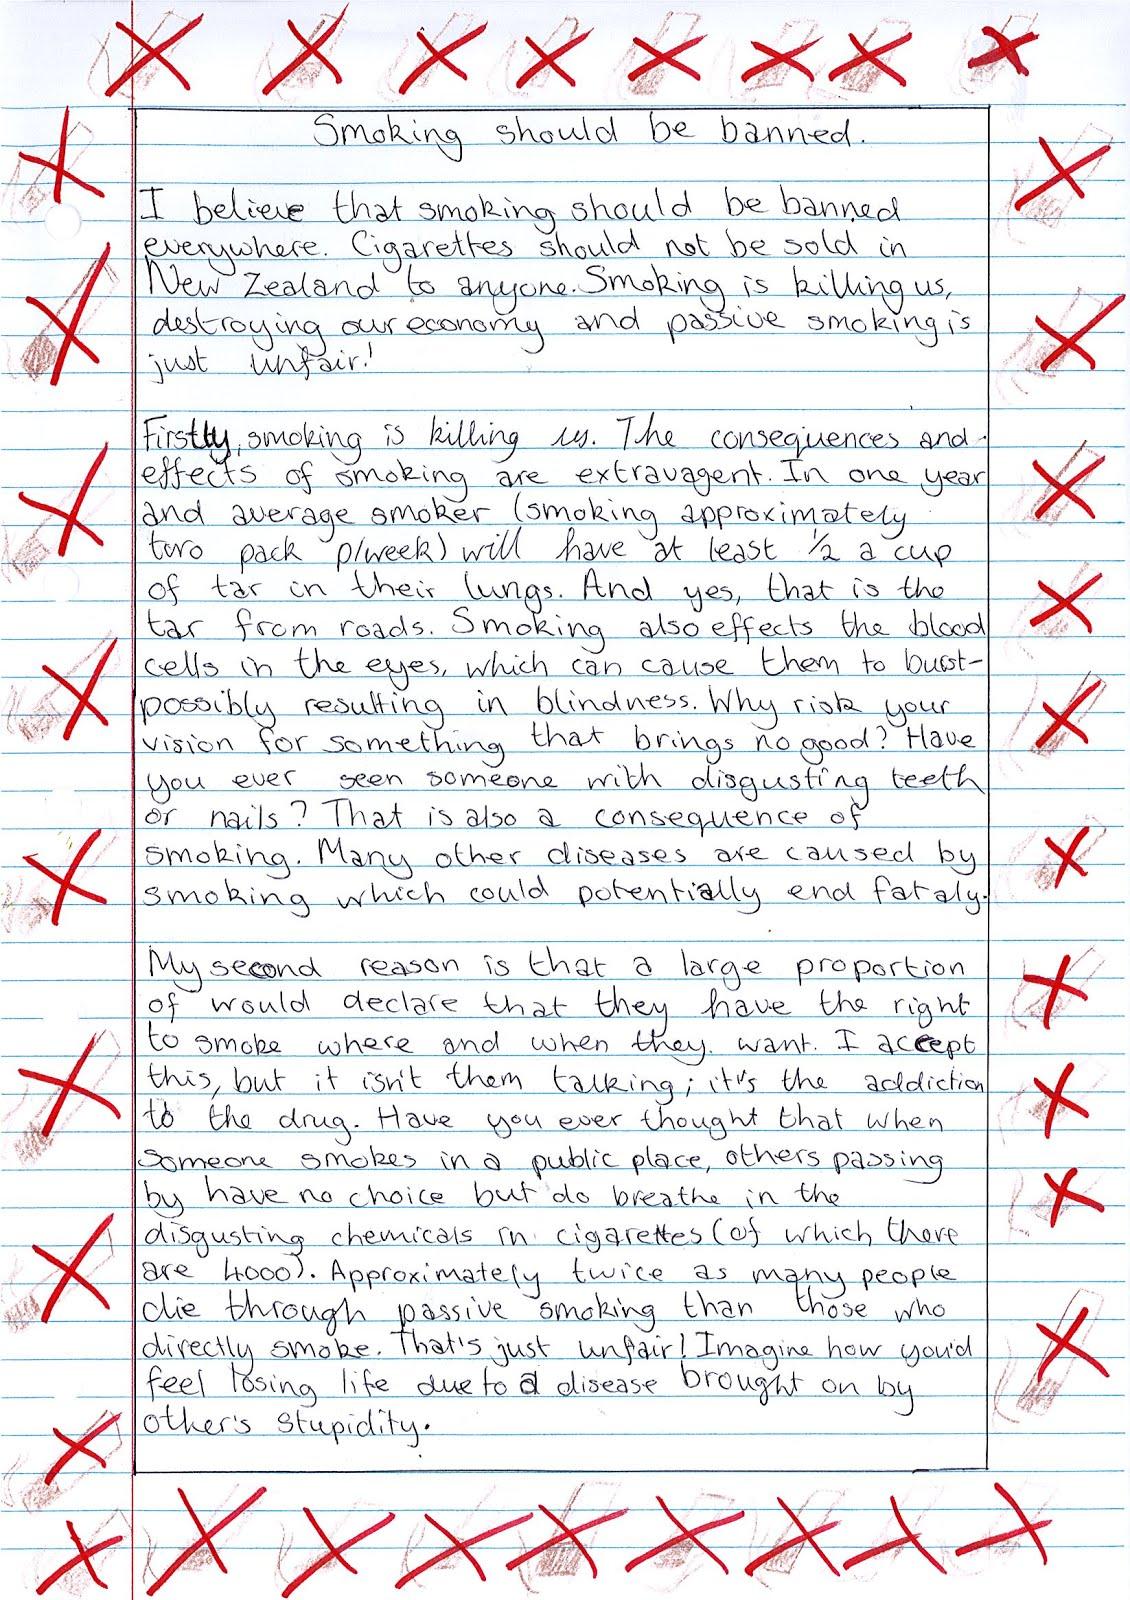 002 Examination Should Abolished Essay Example Smoklng1 Surprising Be Public At School Level Not Full